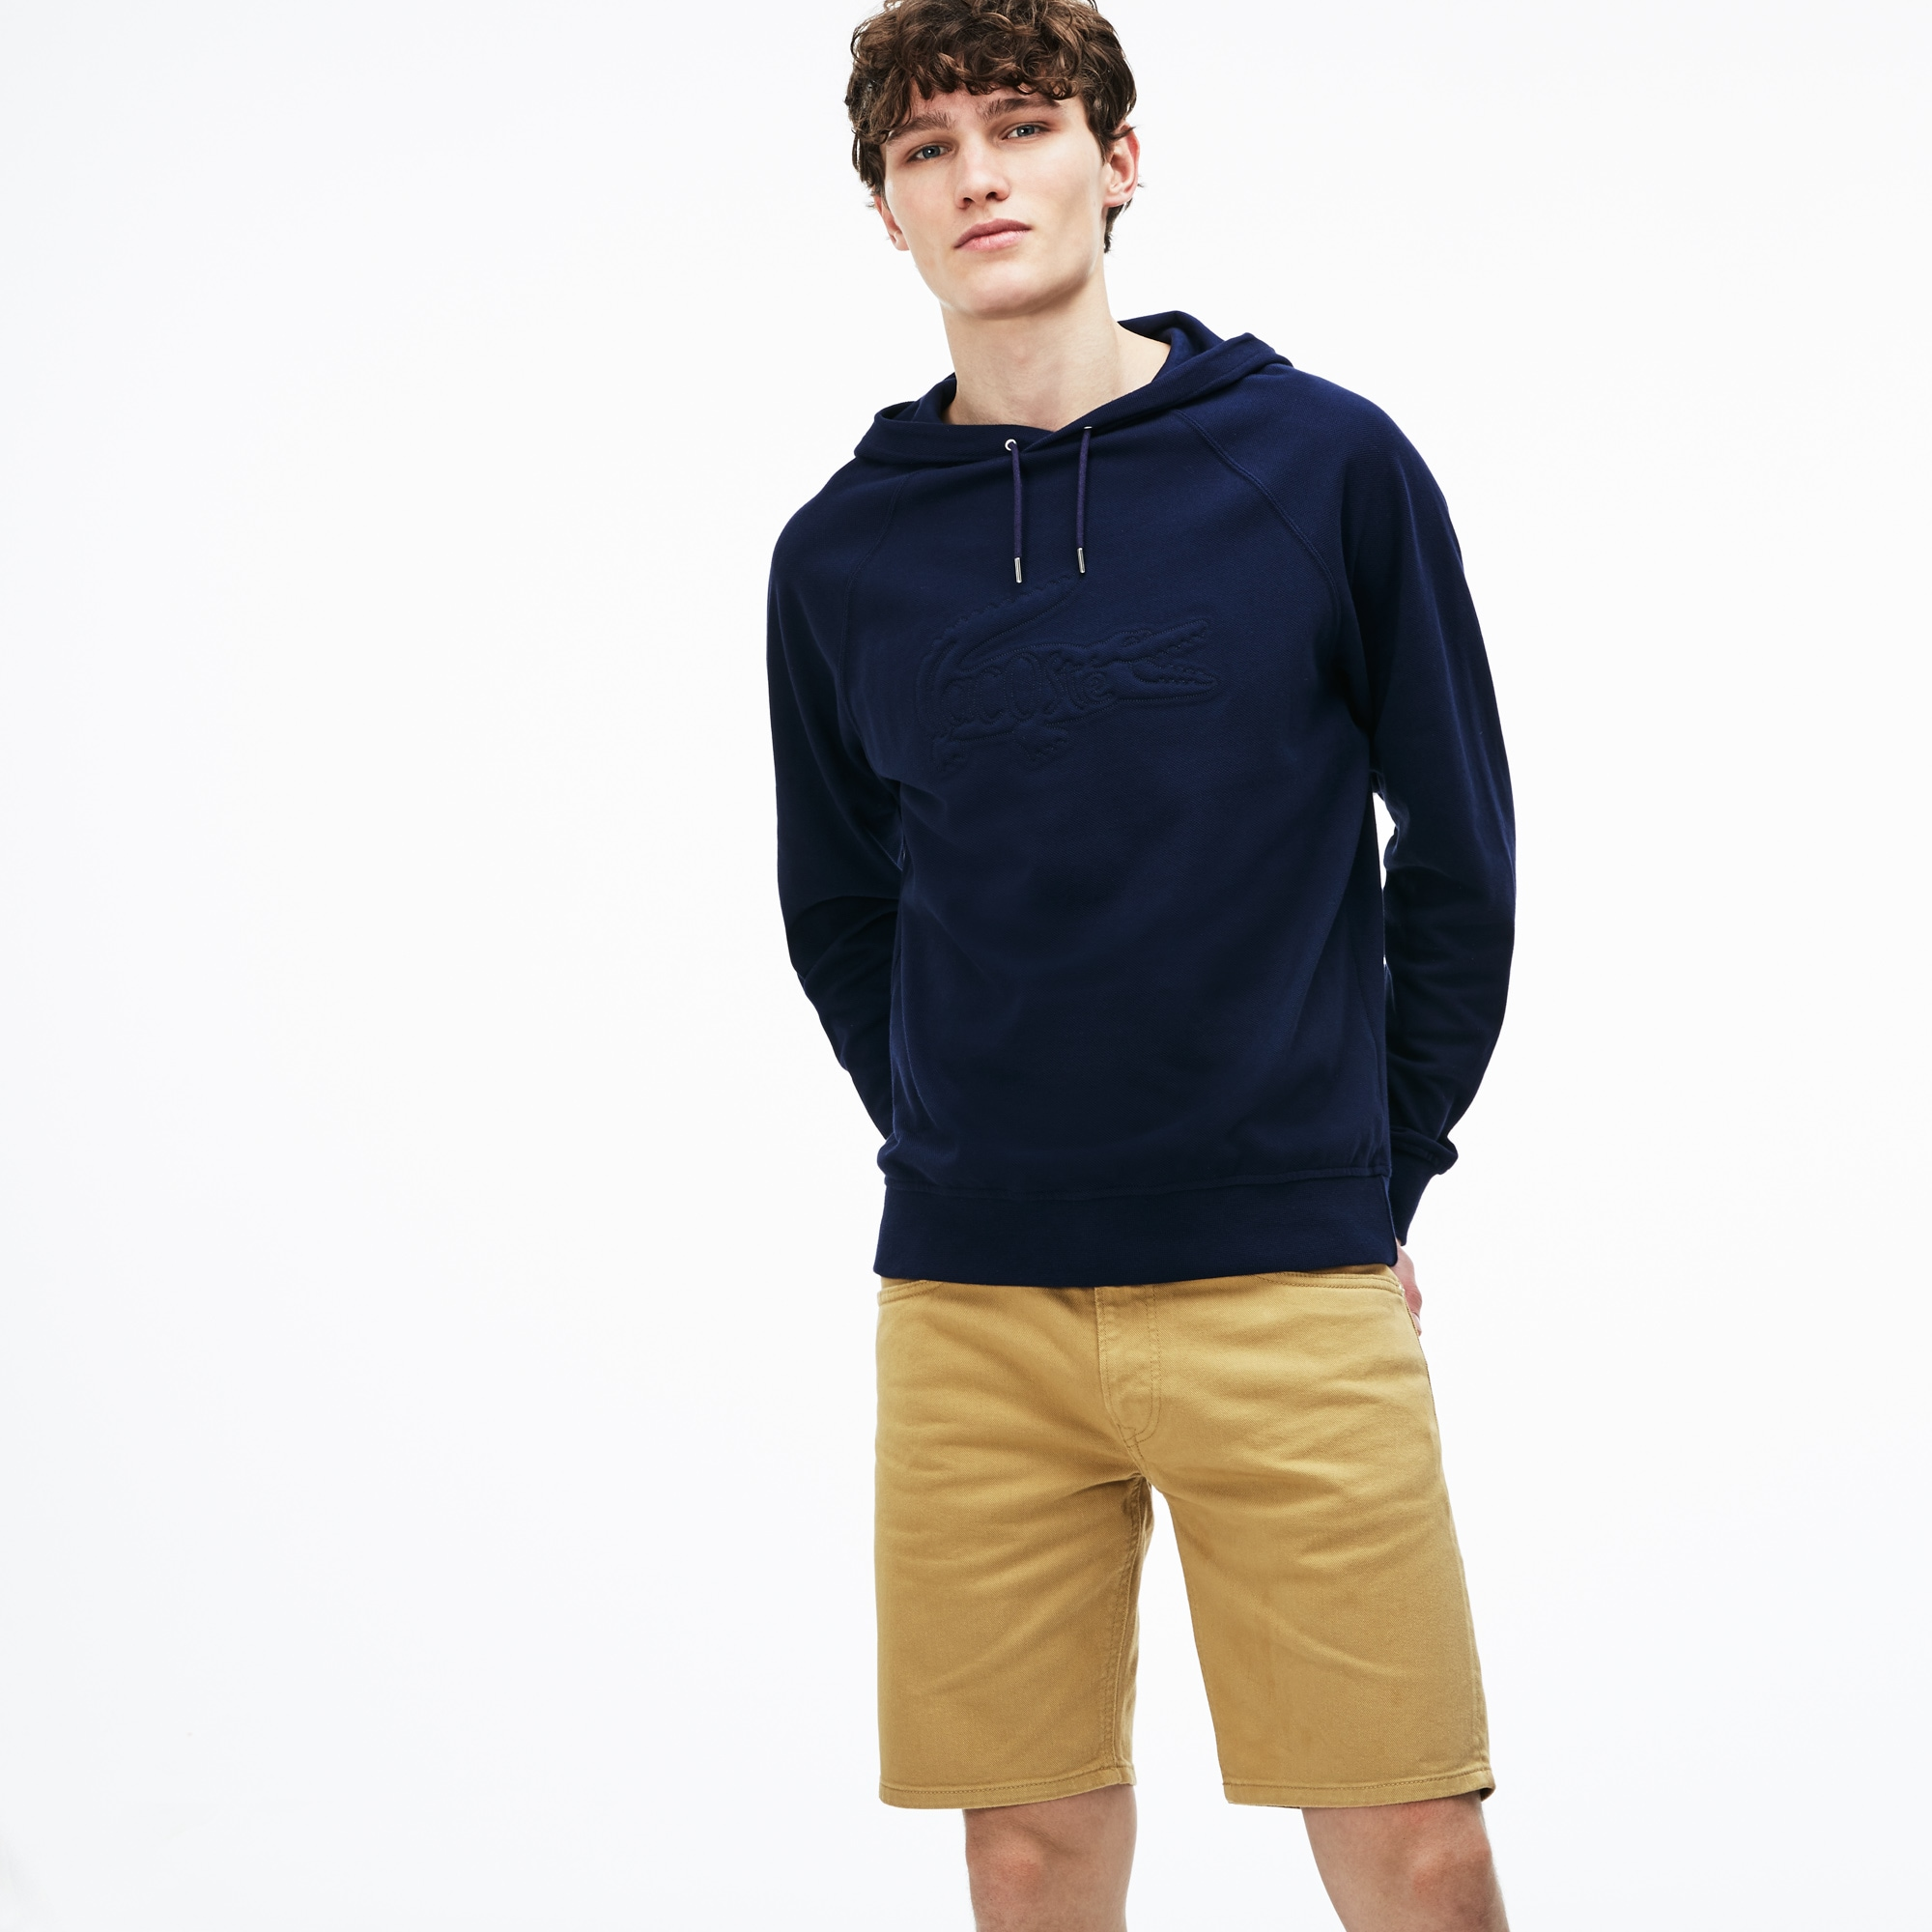 Men's Slim Fit 5 Pocket Stretch Twill Bermuda Shorts